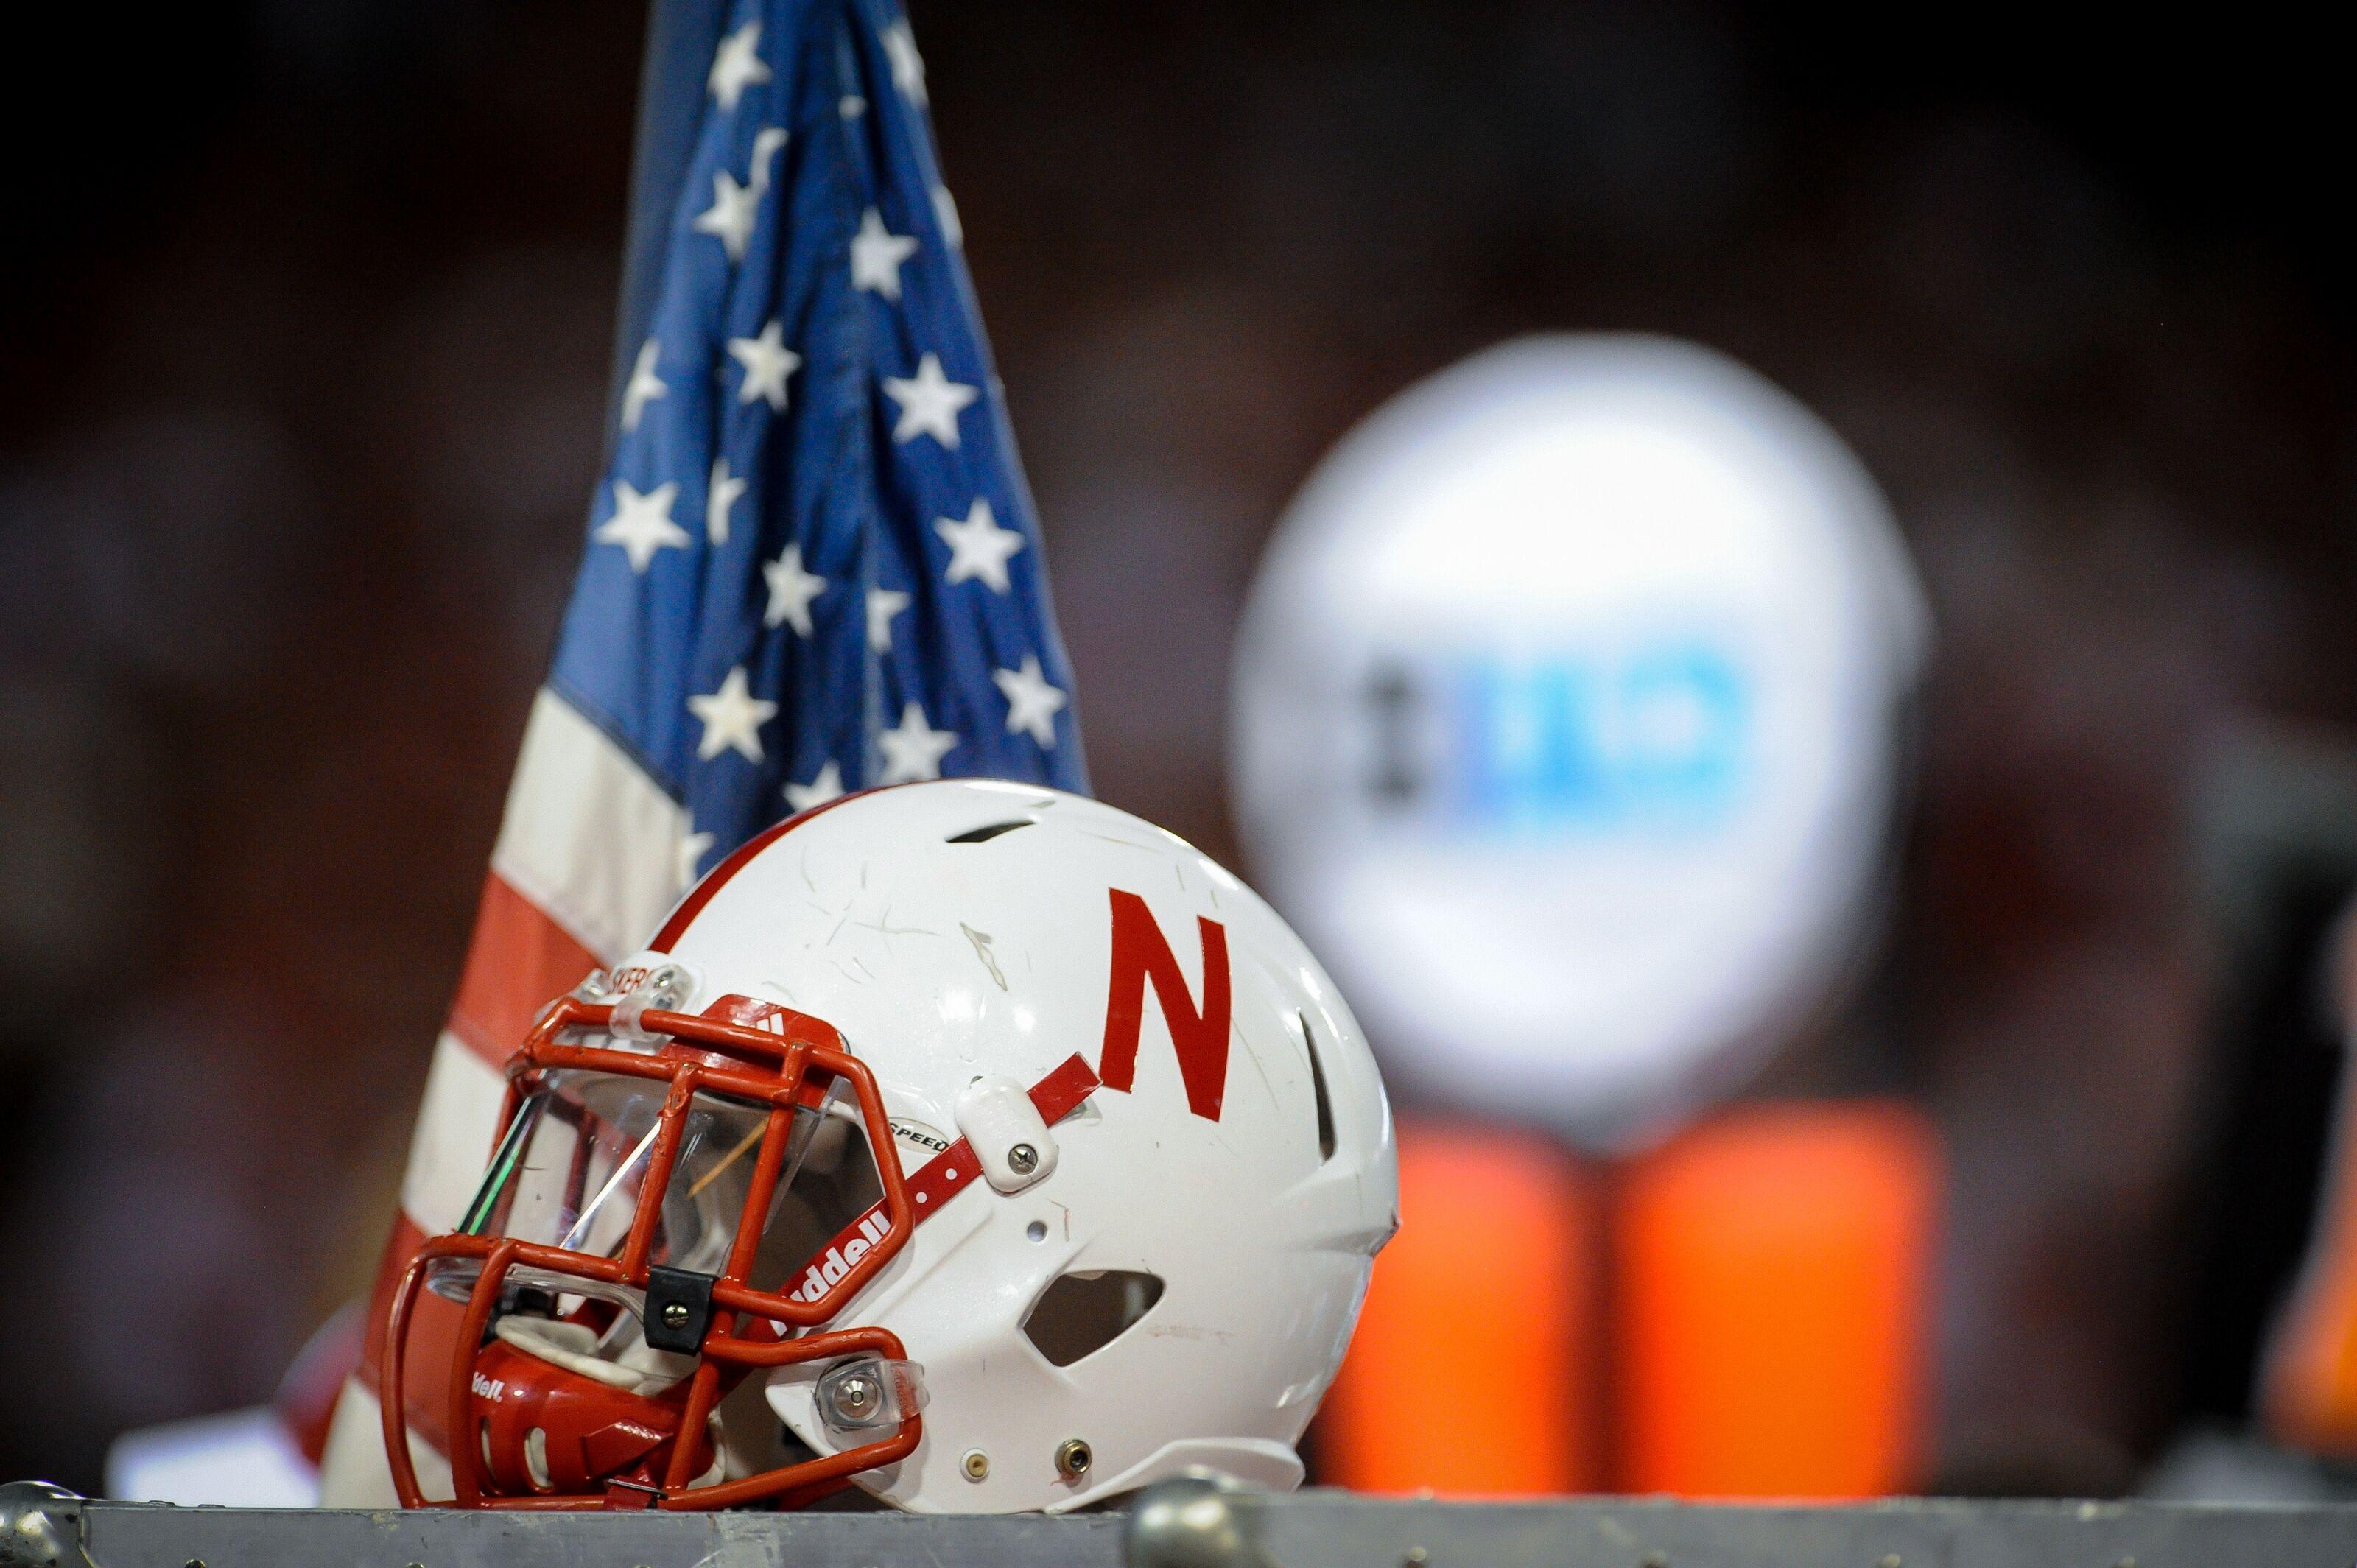 Nebraska Football: Tailgate ideas for Week 4 vs Illinois